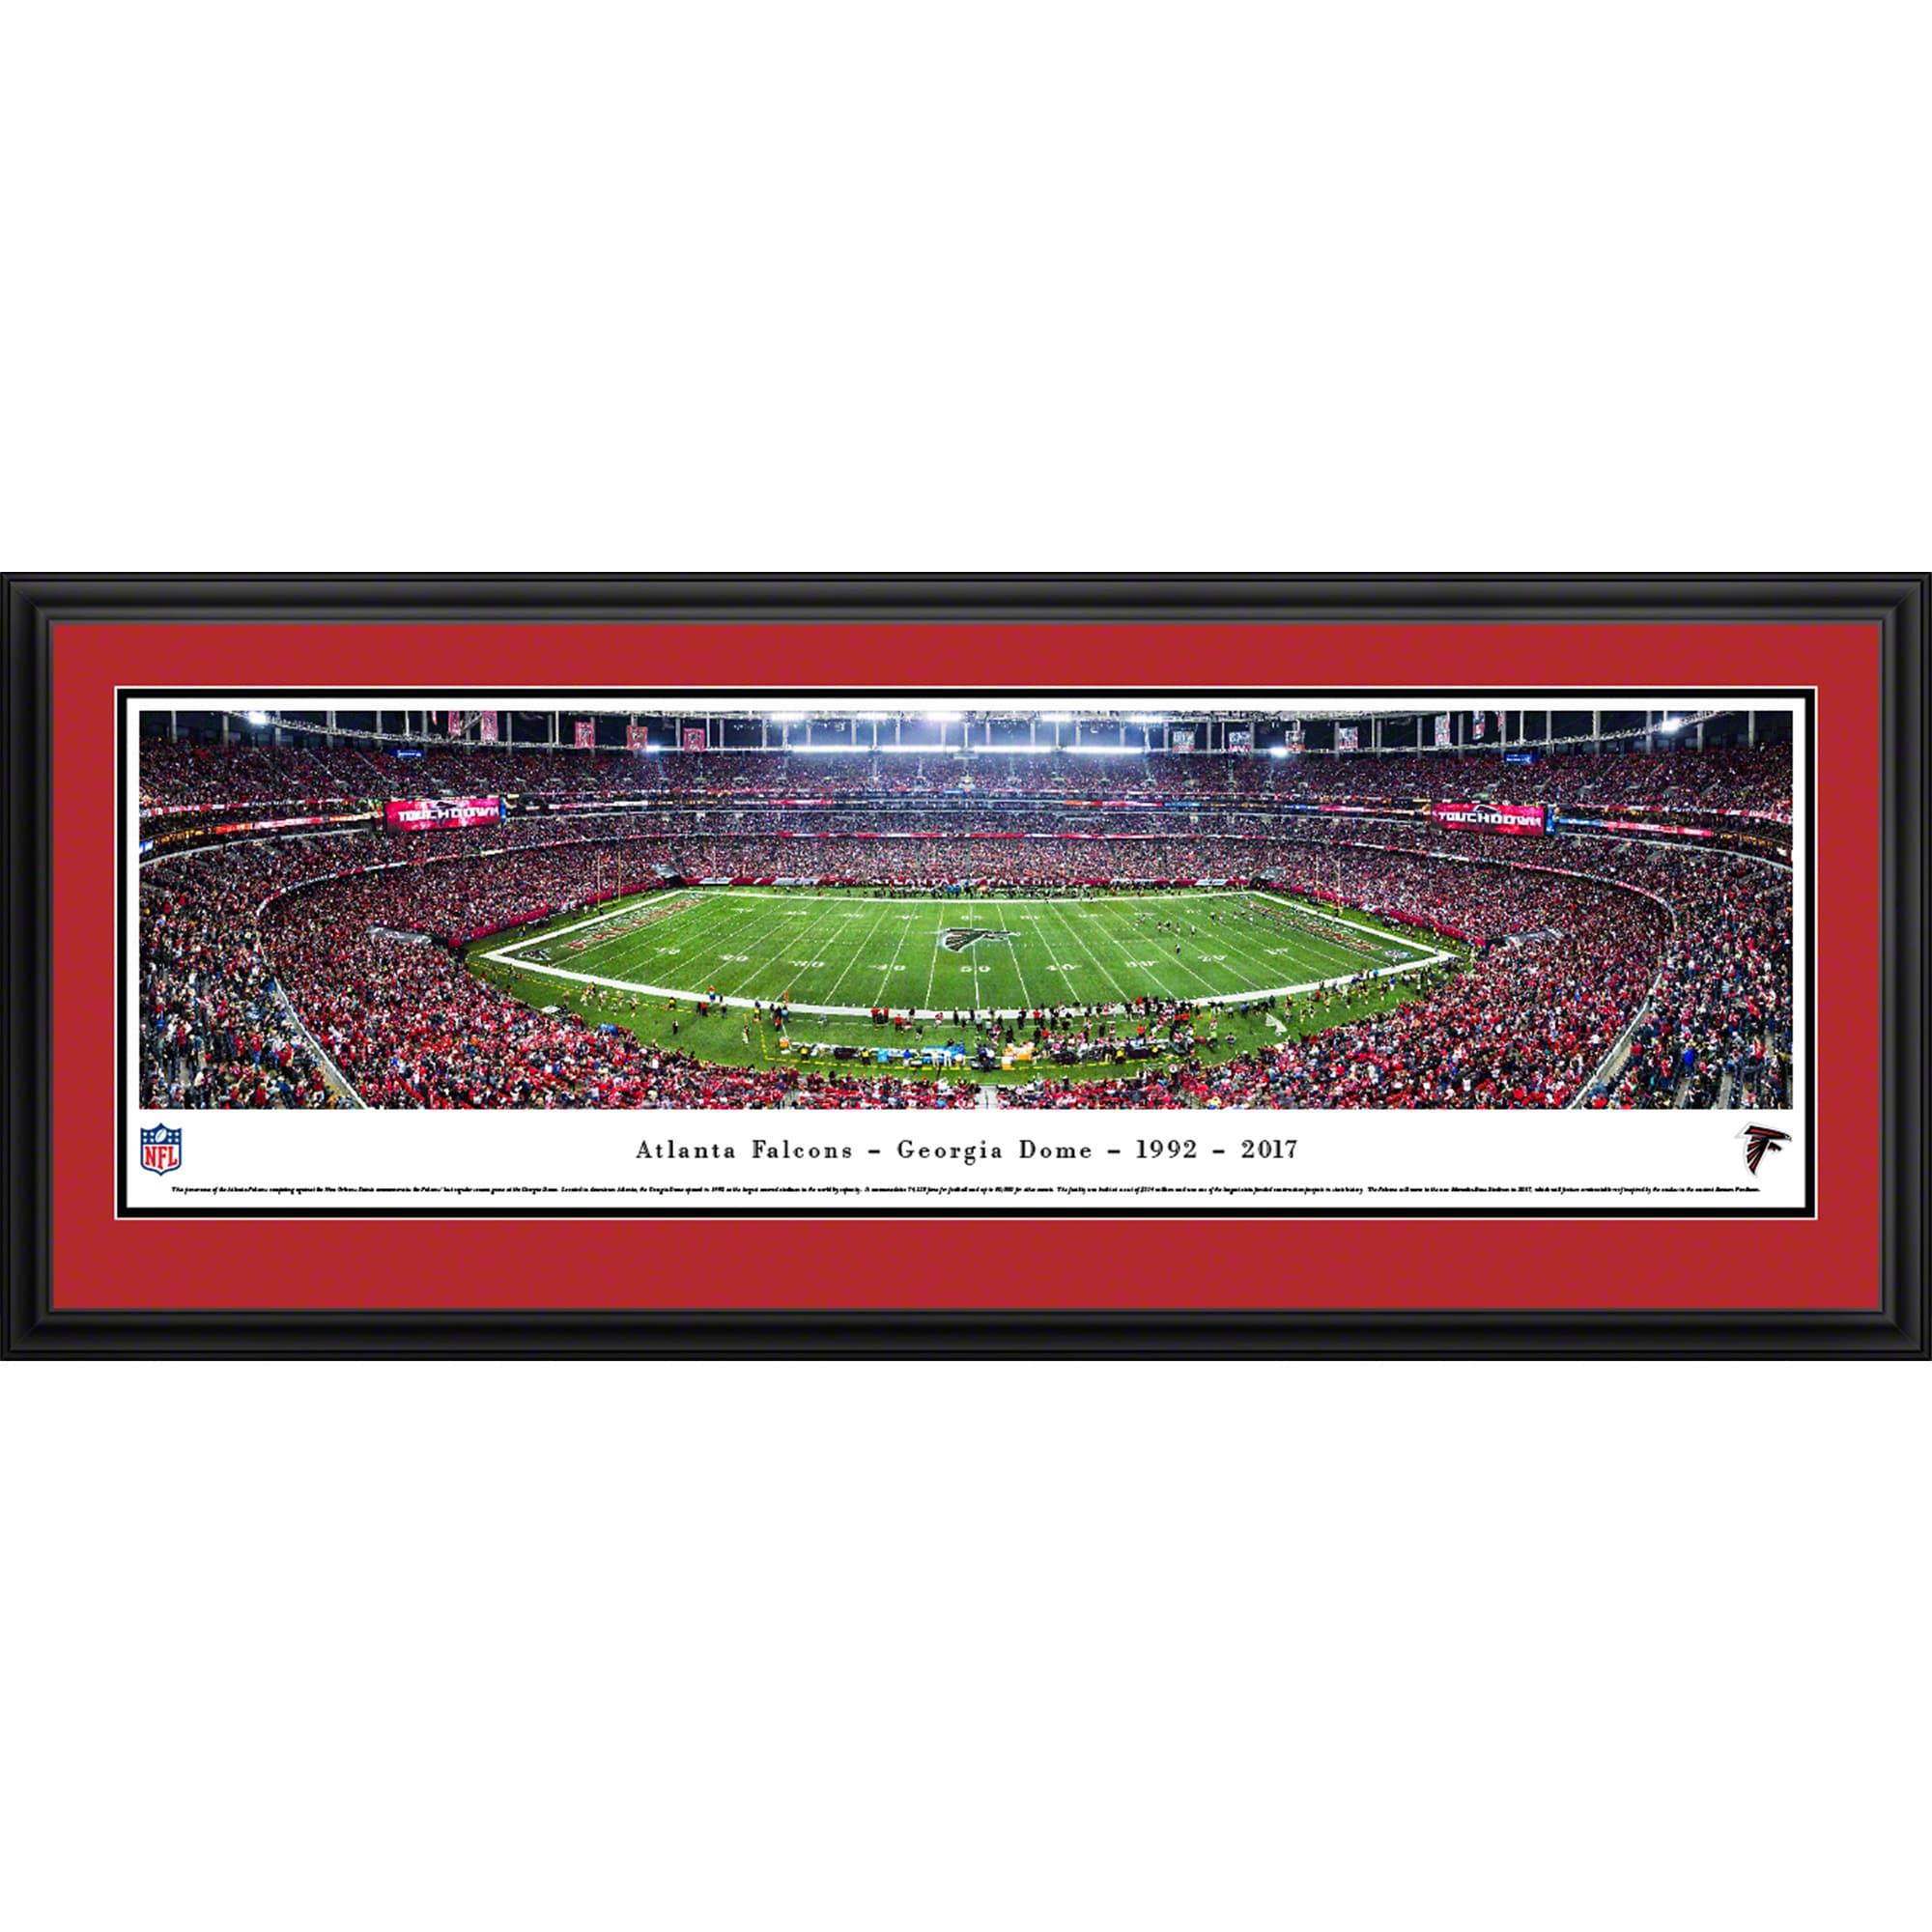 Cheap Shop Atlanta Falcons Final Game at Georgia Dome Blakeway  for sale